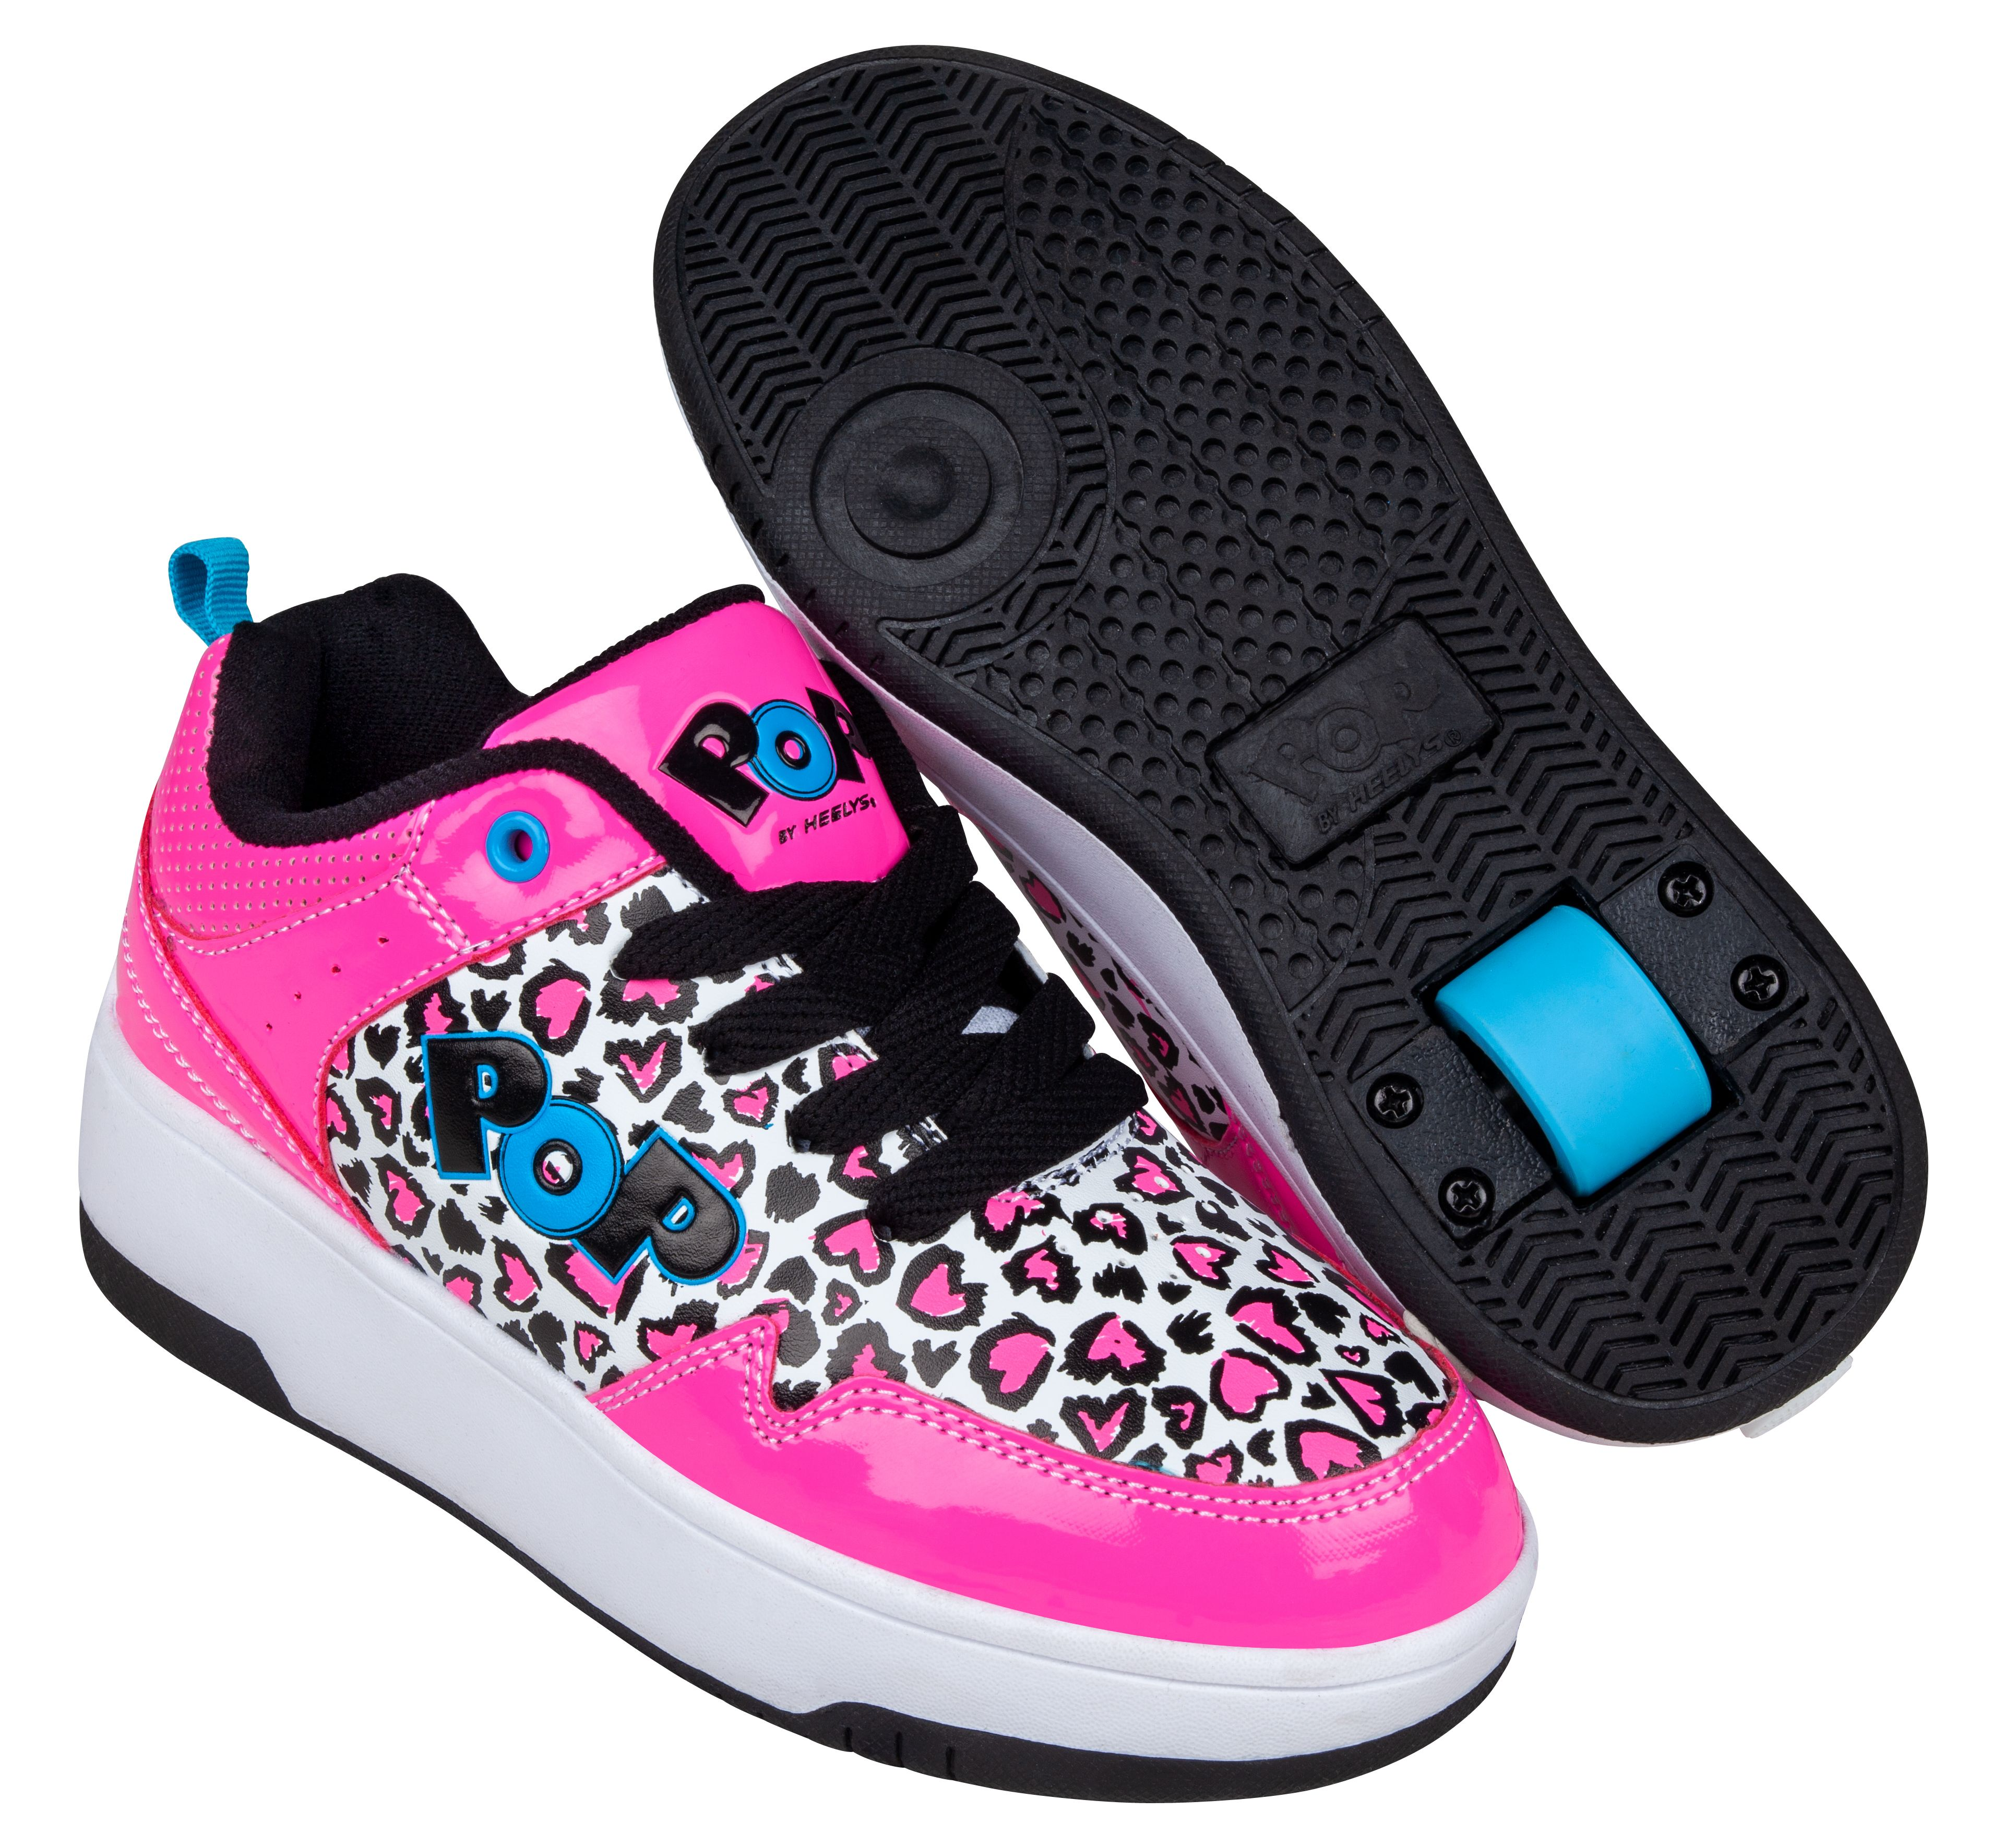 Heelys POP Shoes - Neon Pink (size 33) (POP-G1W-0058)